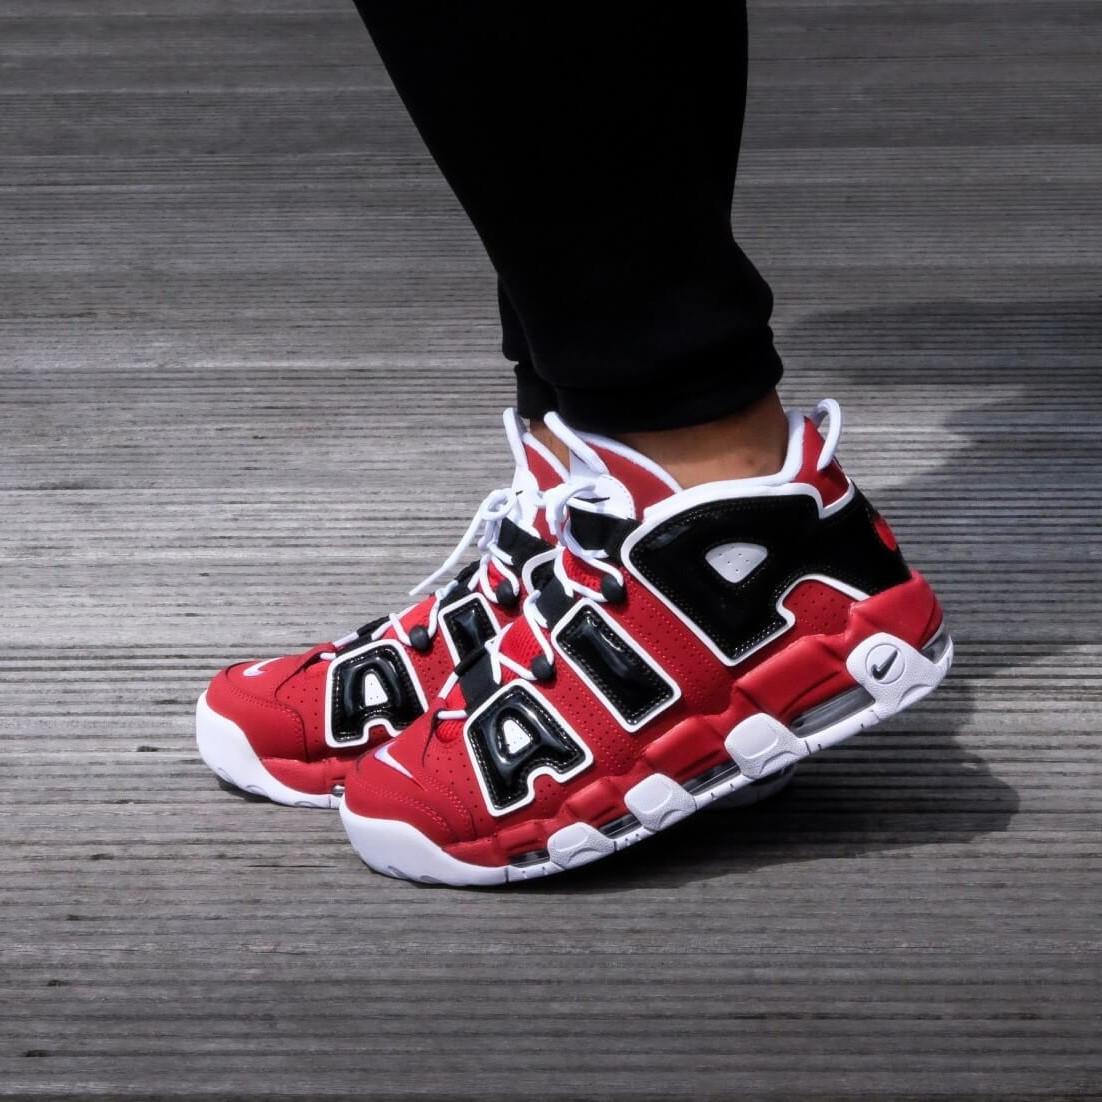 "Кроссовки Nike Air More Uptempo 96 Bulls ""Red"" (Красные)"